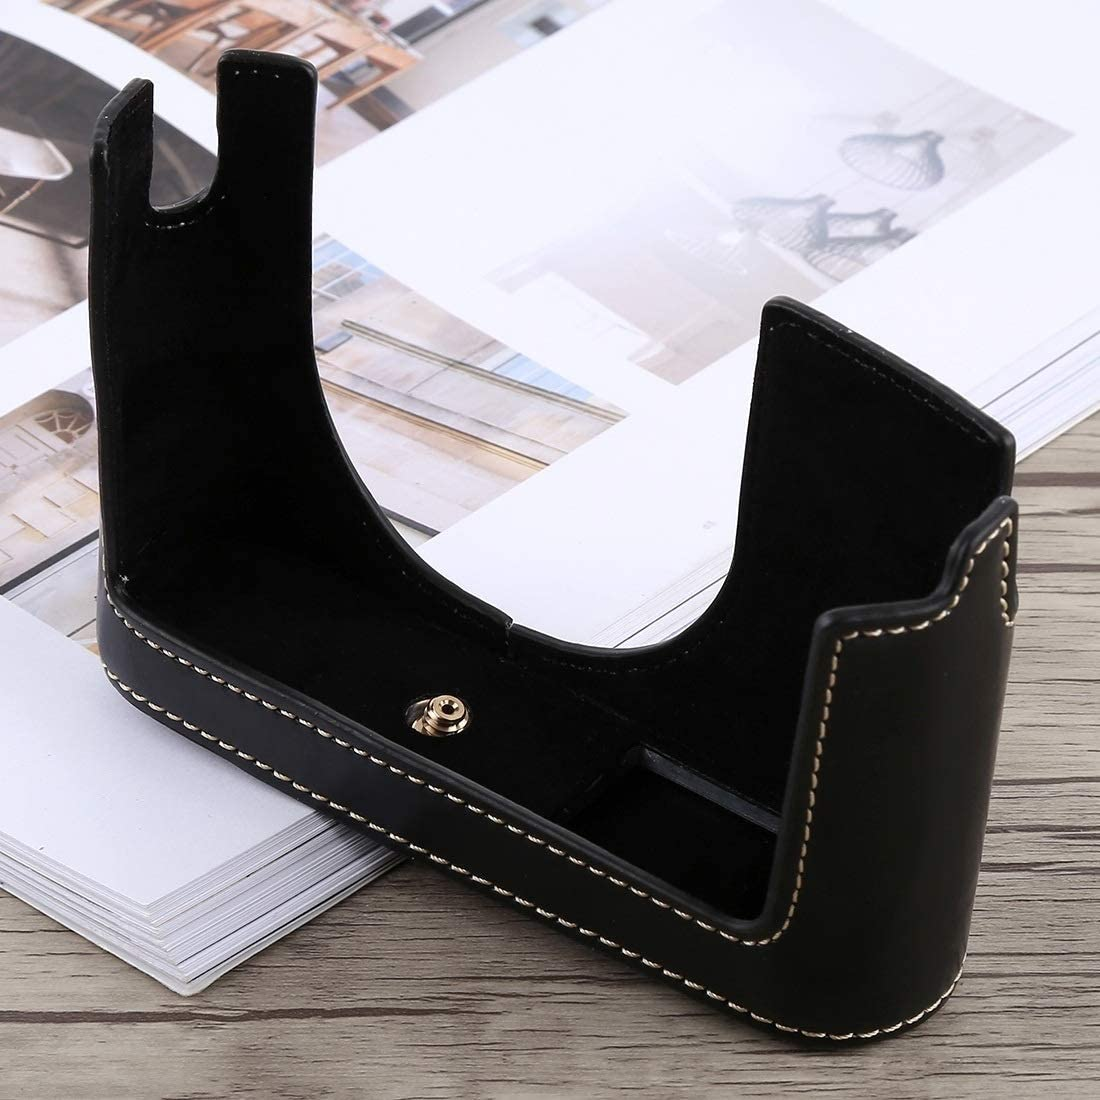 Typ 116 Black Color : Black Ychaoya High-end Camera Case Wuzpx 1//4 inch Thread PU Leather Camera Half Case Fundament for Leica Q